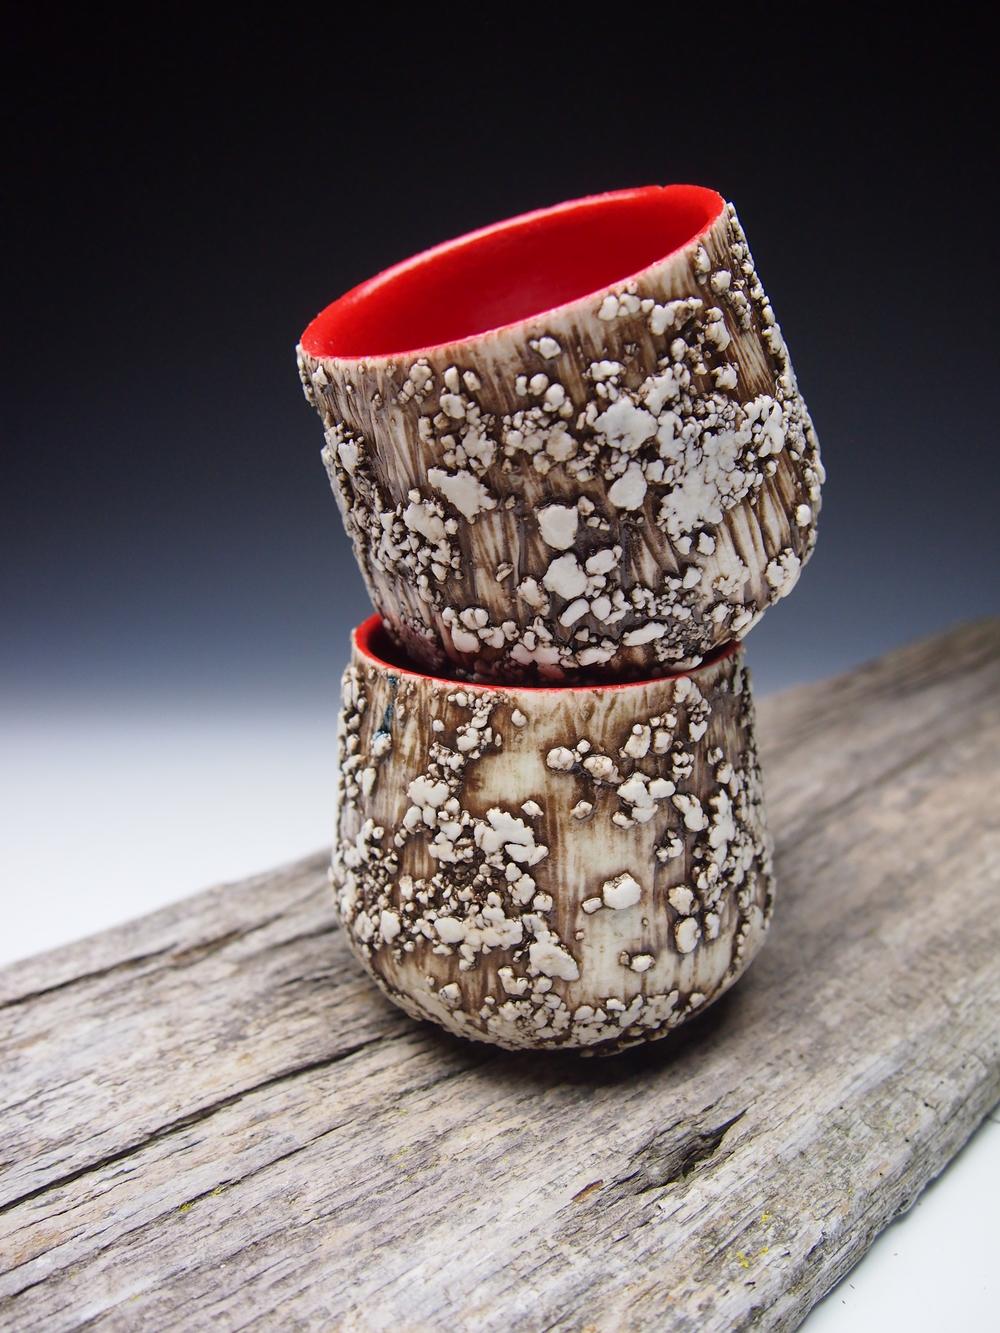 small lichen cups - red.jpg